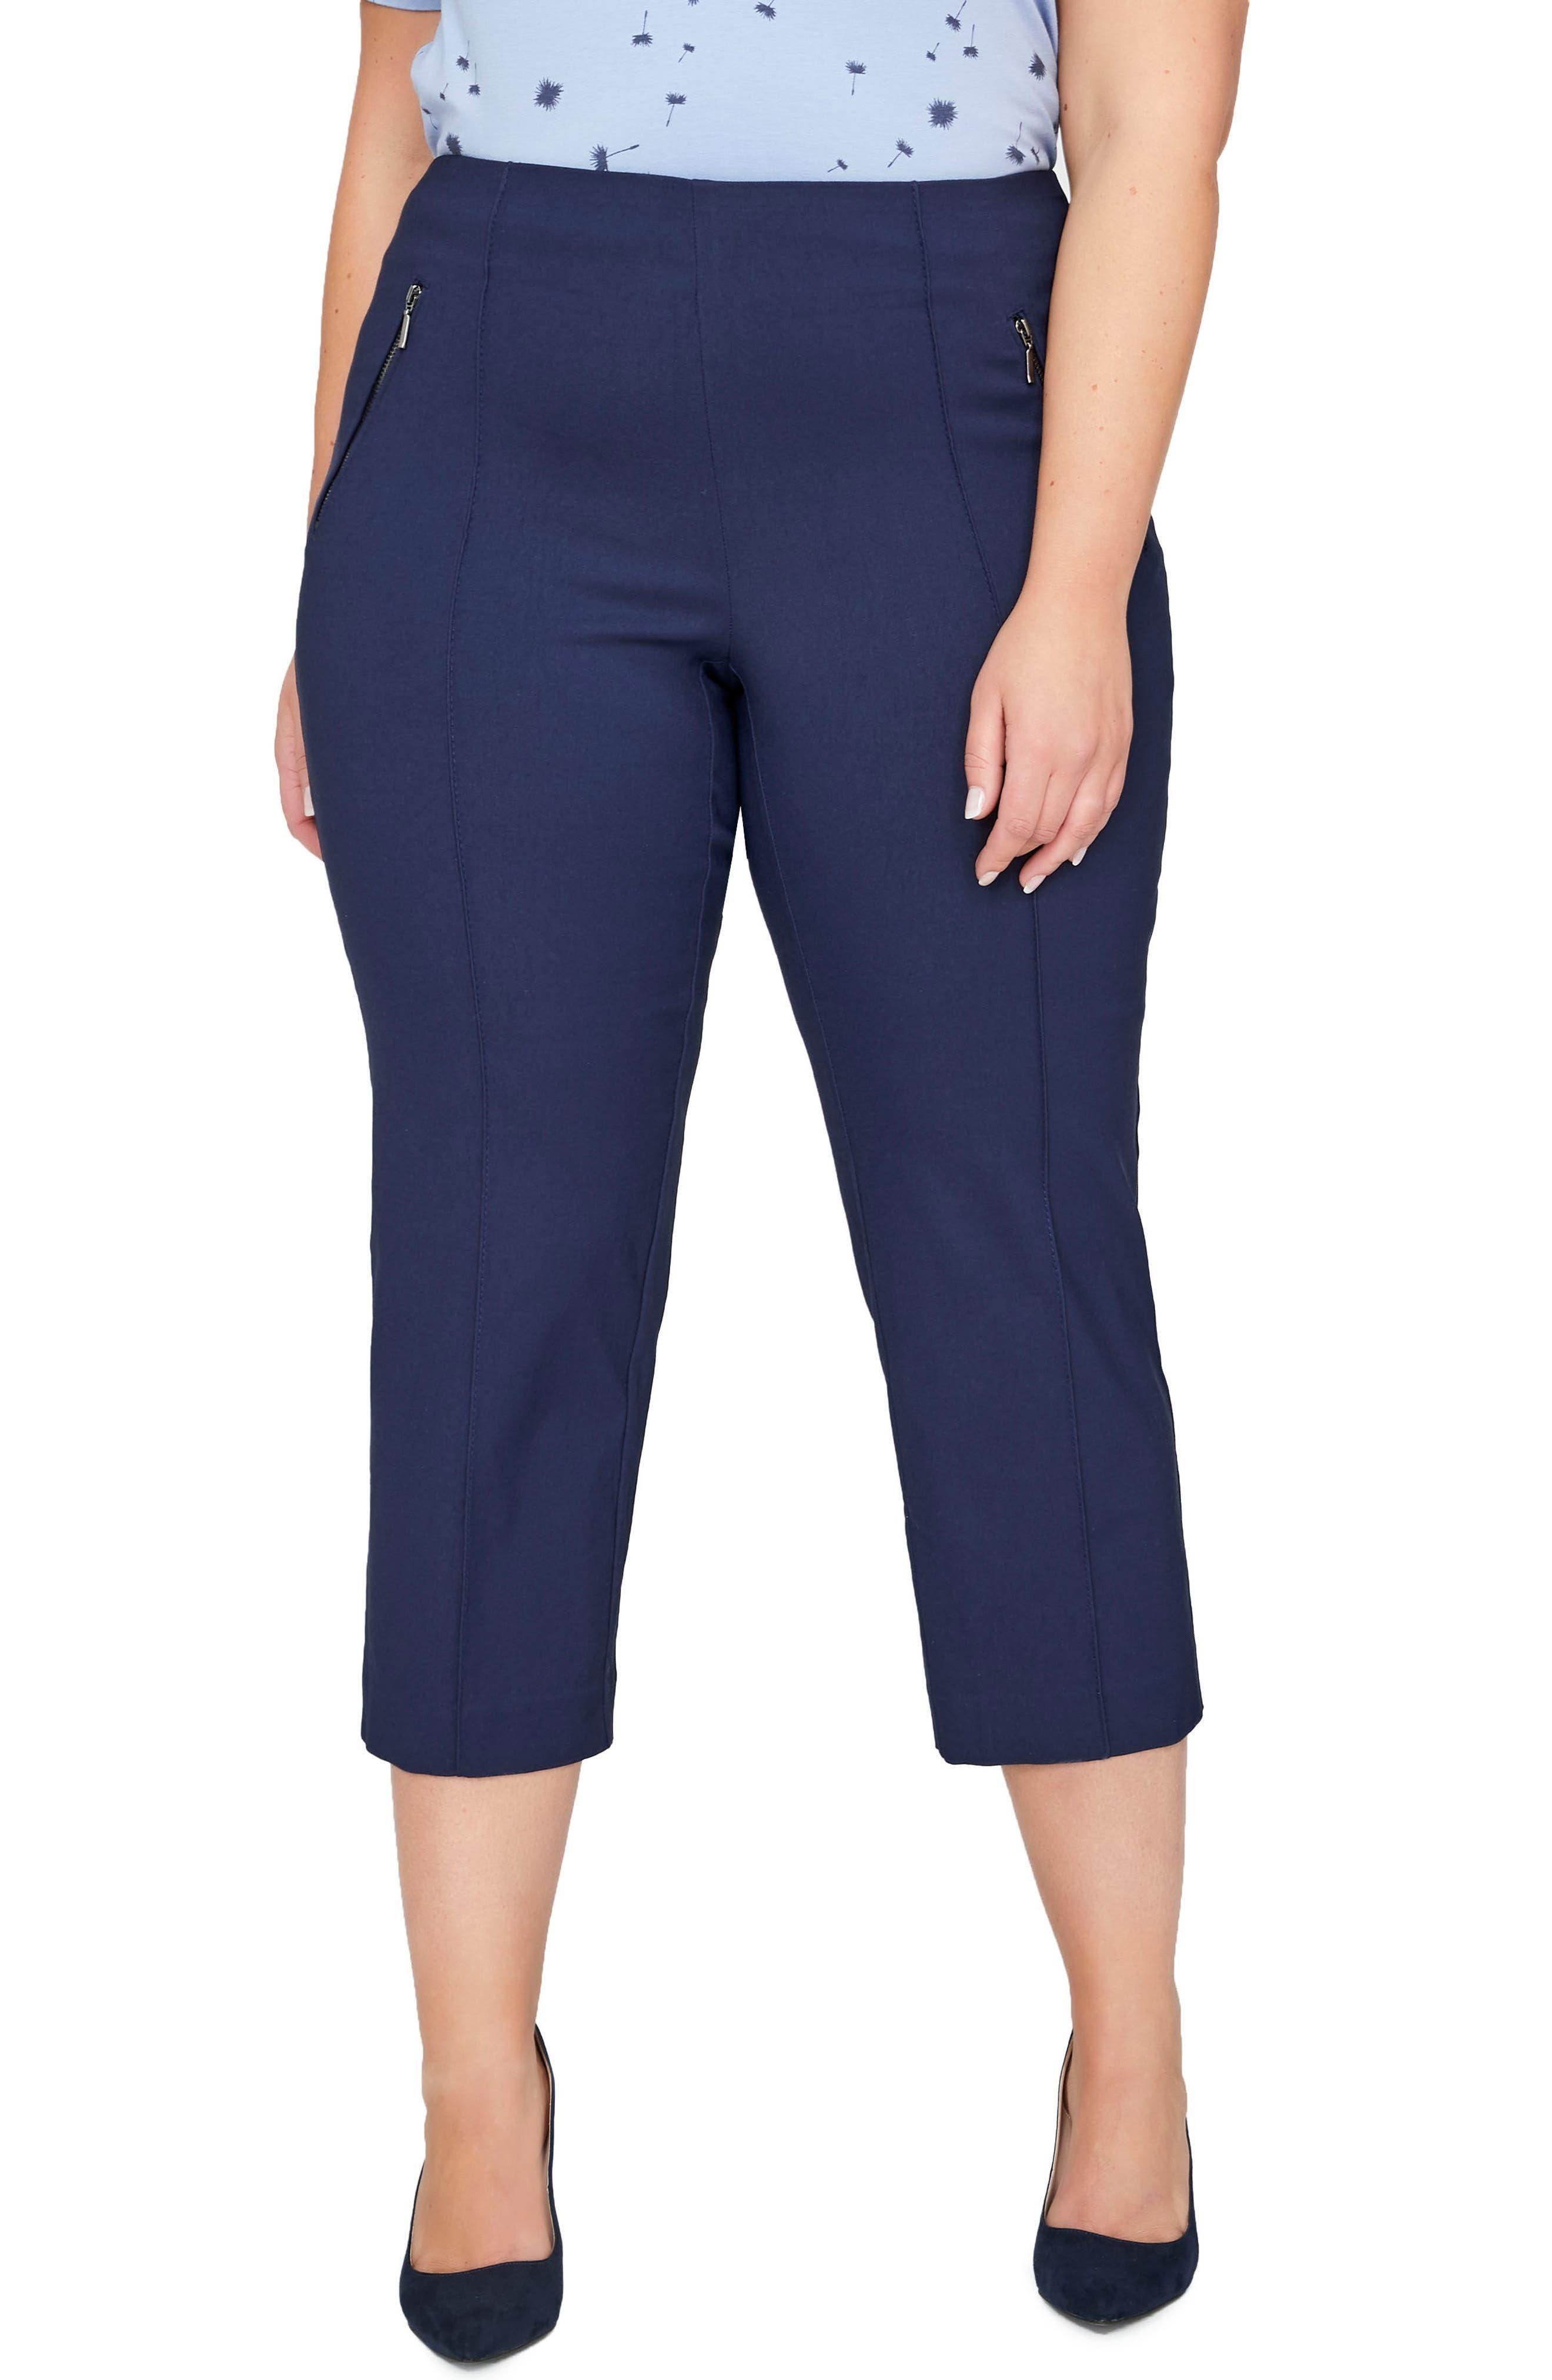 MICHEL STUDIO Alexa Crop Pants (Plus Size)